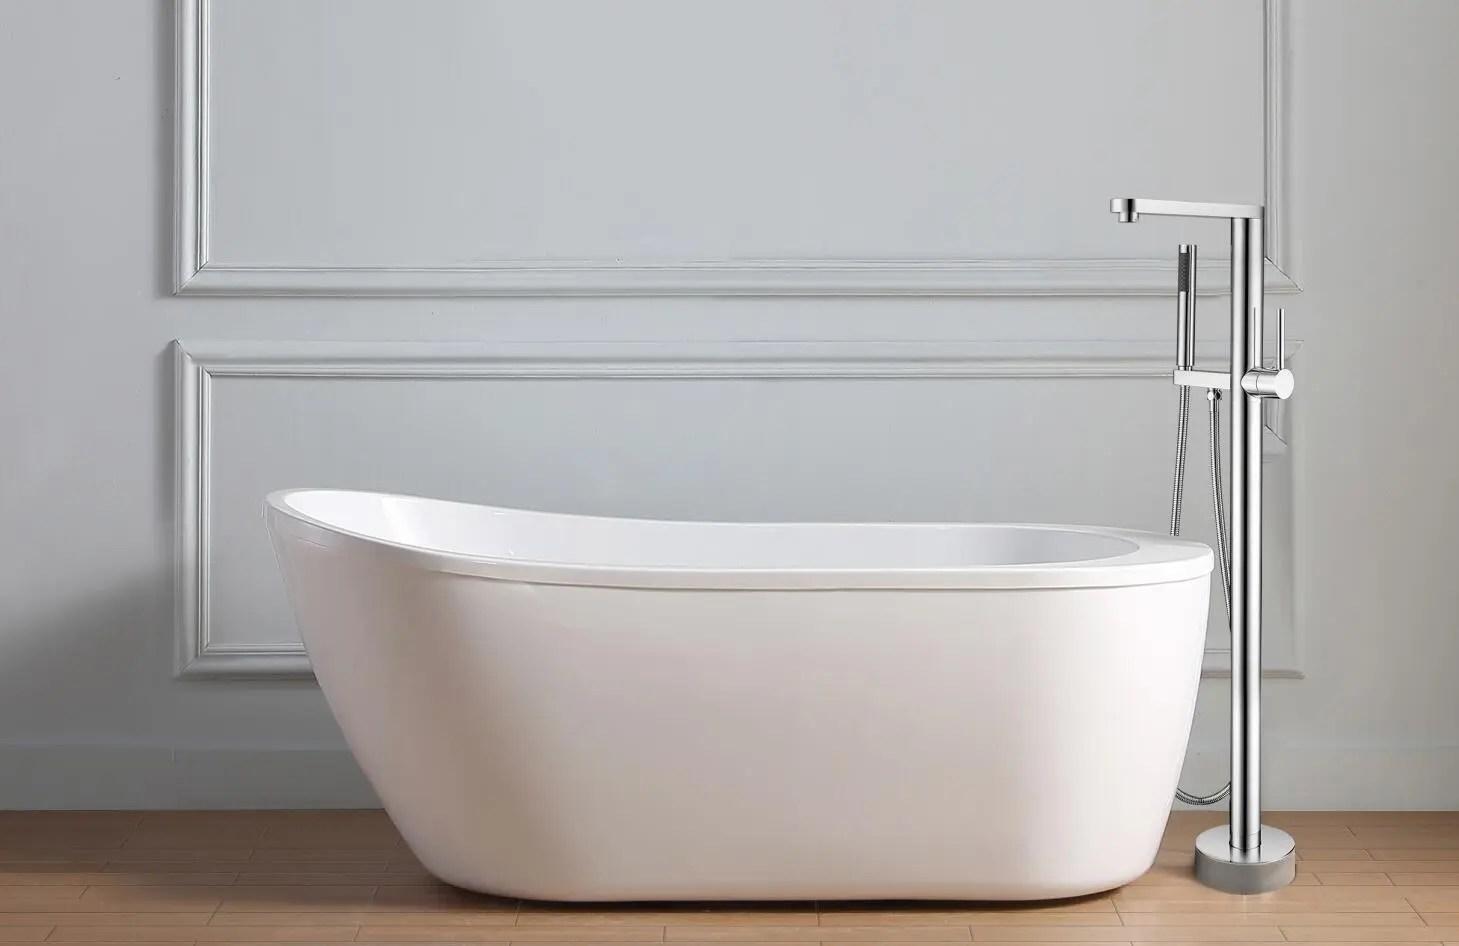 chrome floor mounted shower bath tub faucet free standing tub filler brass freestanding bathroom bathtub faucets buy cupc watermark free standing